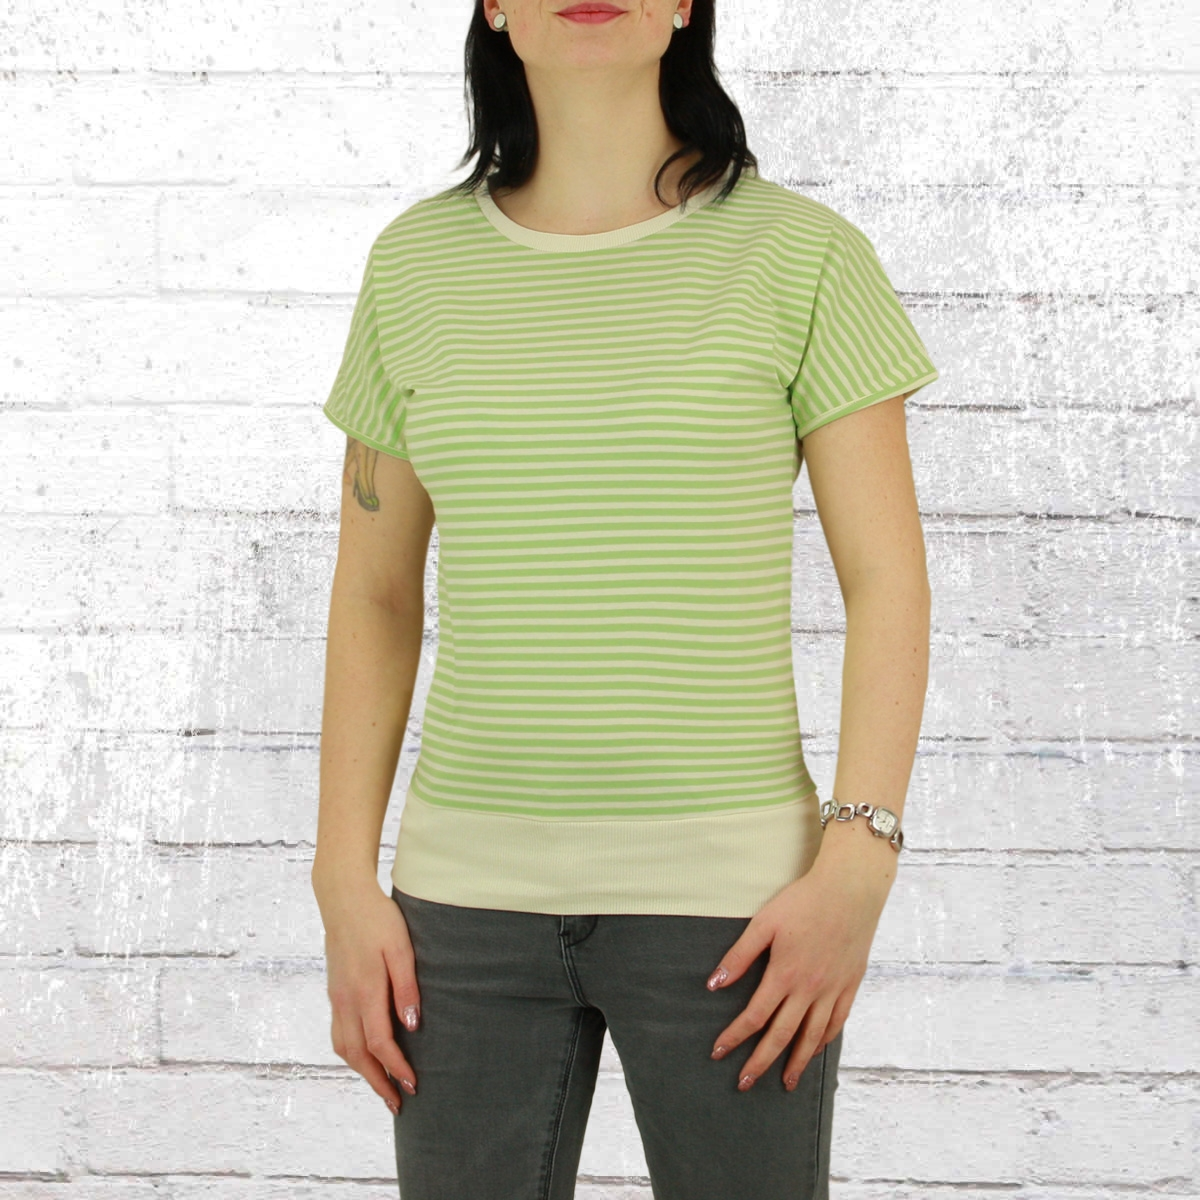 Greenbomb Frauen T-Shirt Basic Brave grün gestreift